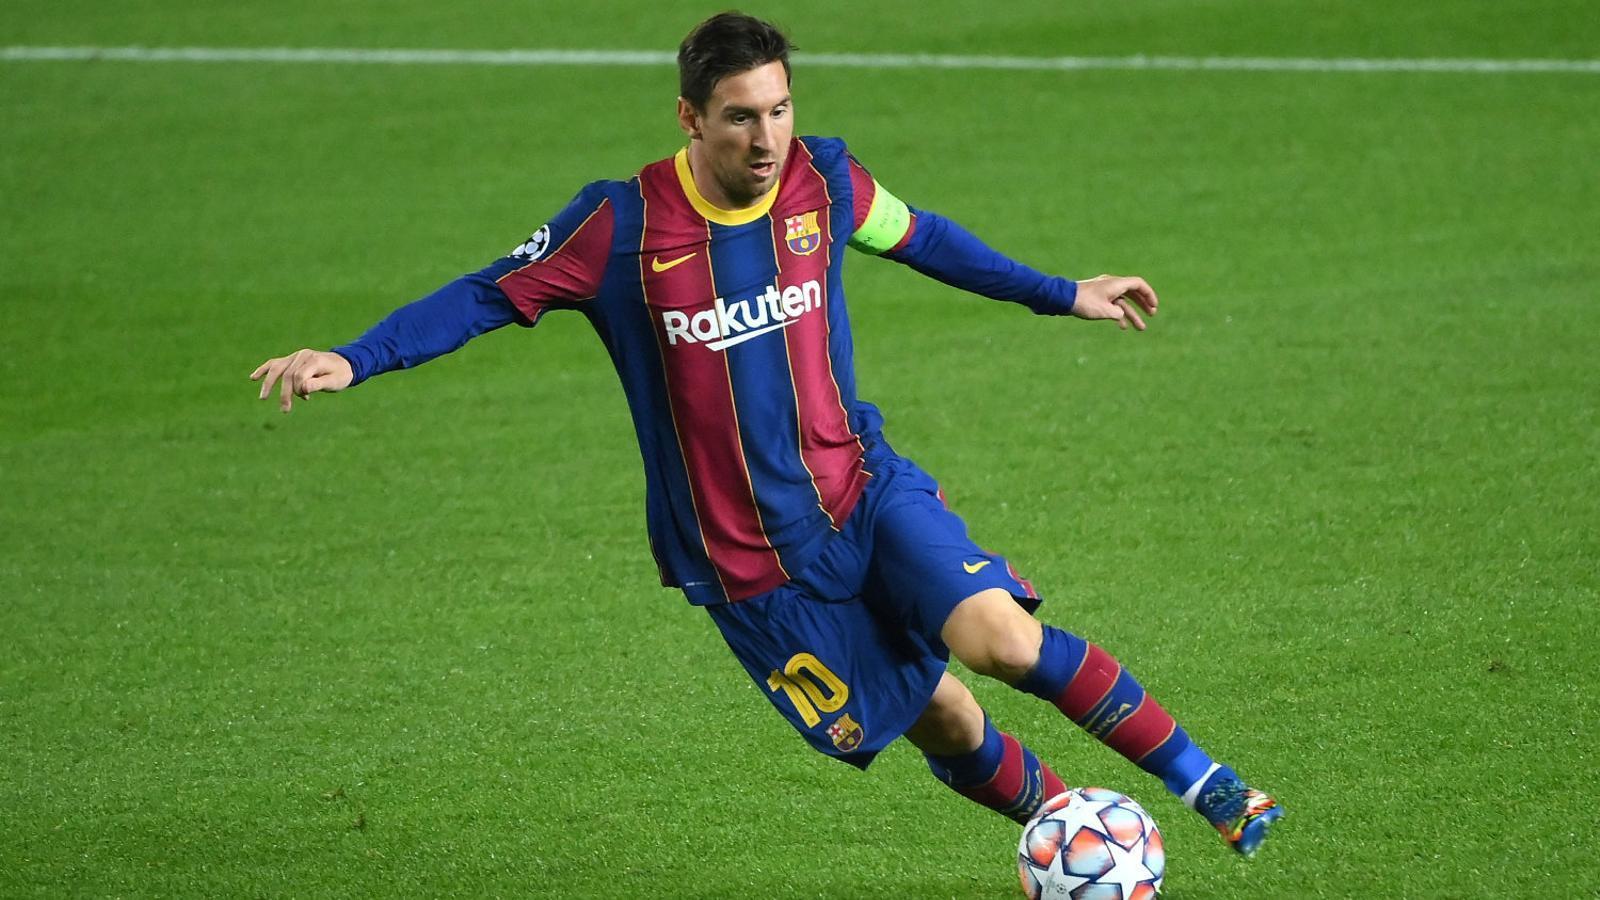 El Barça necessita retallar la despesa en 190 milions